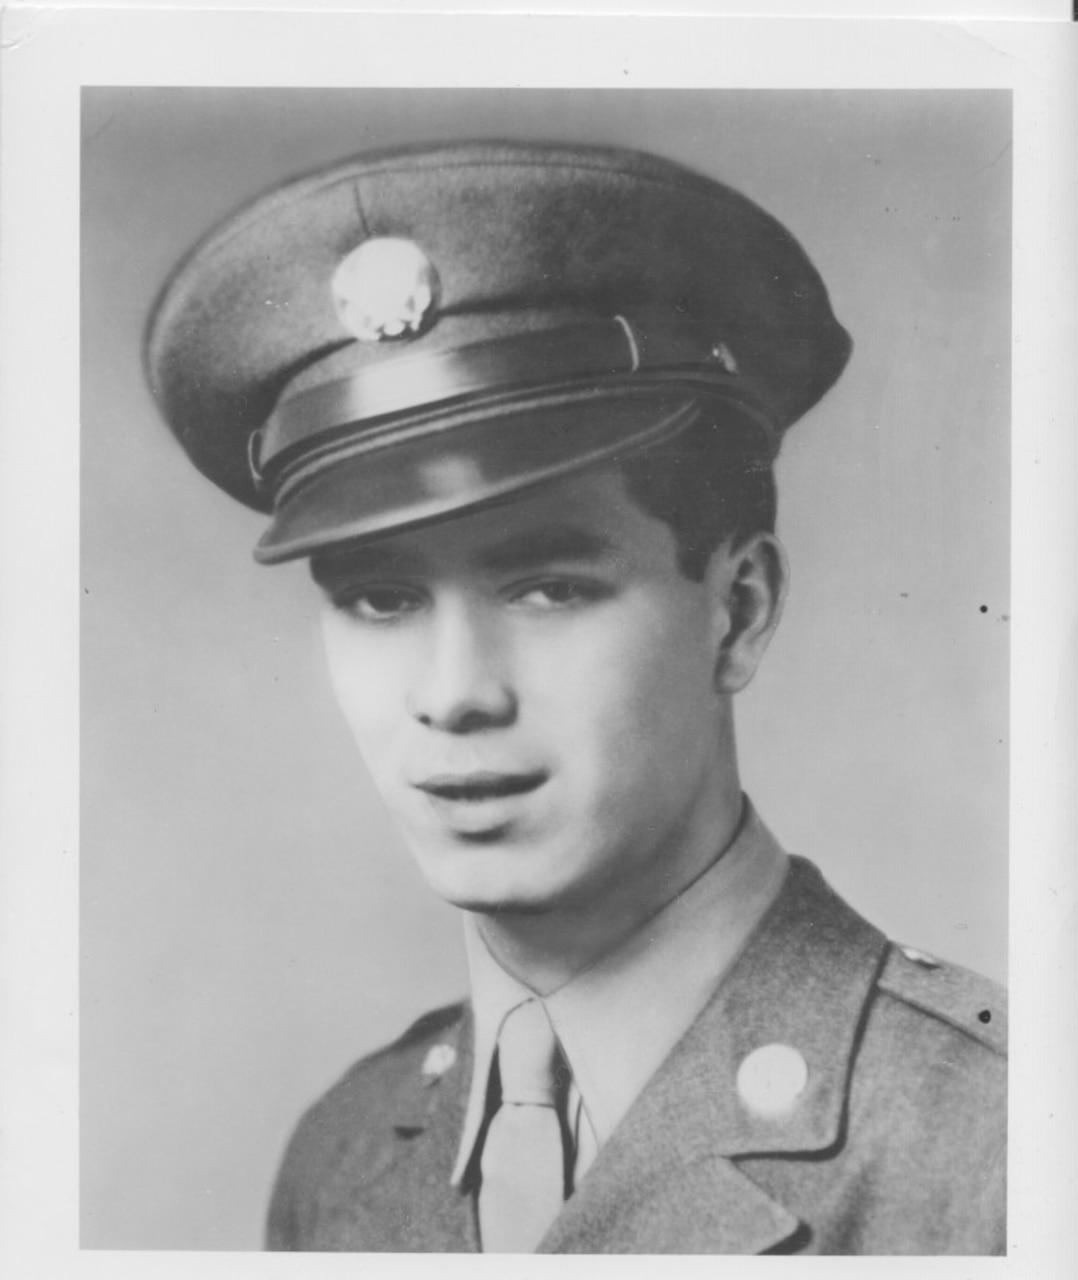 A young man wears a cap and dress uniform.